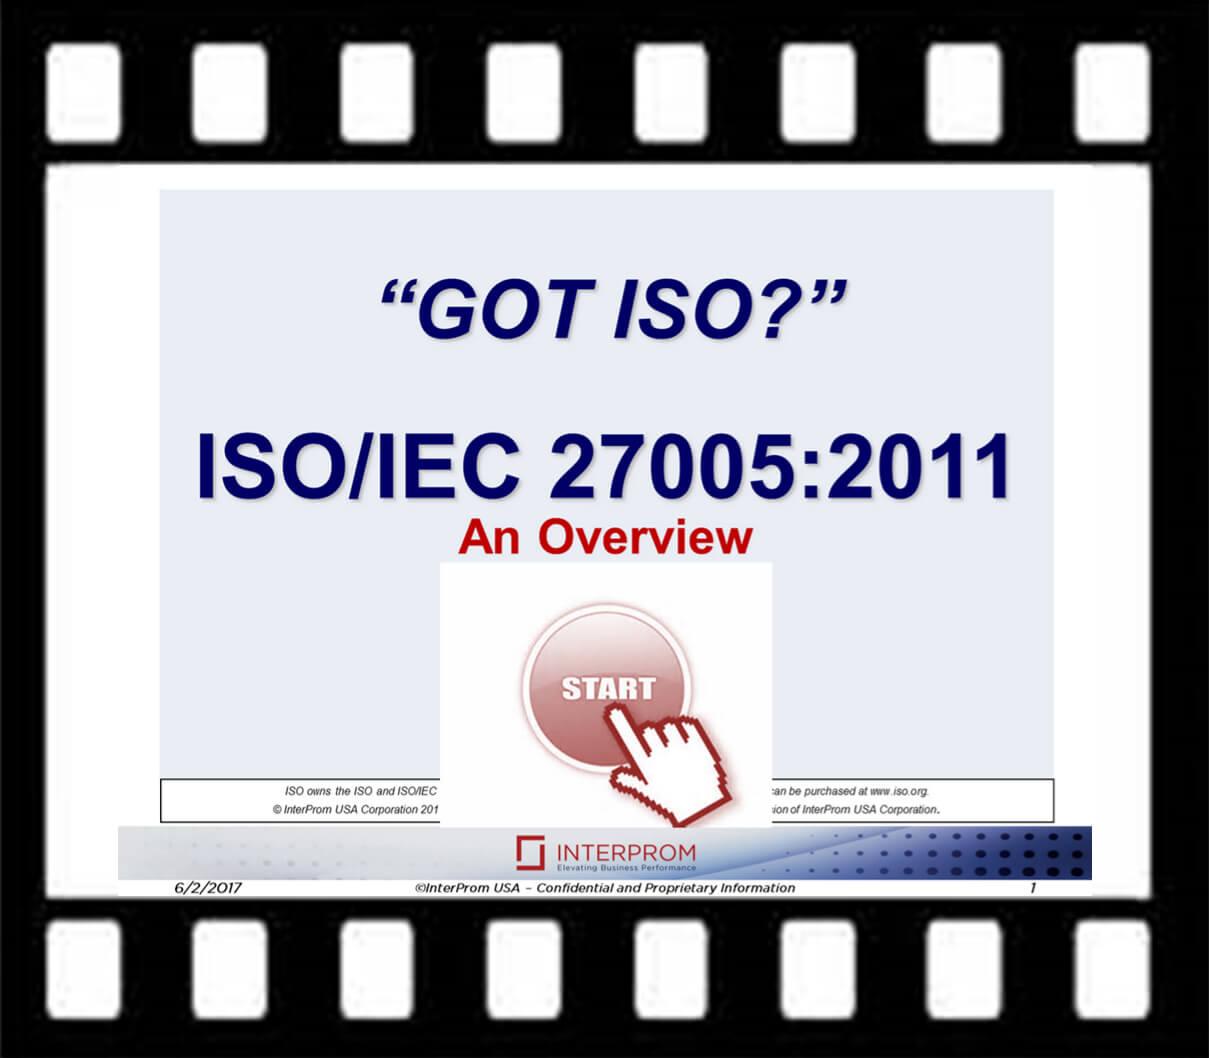 GOT ISO/IEC 27005 Overview Webinar Recording